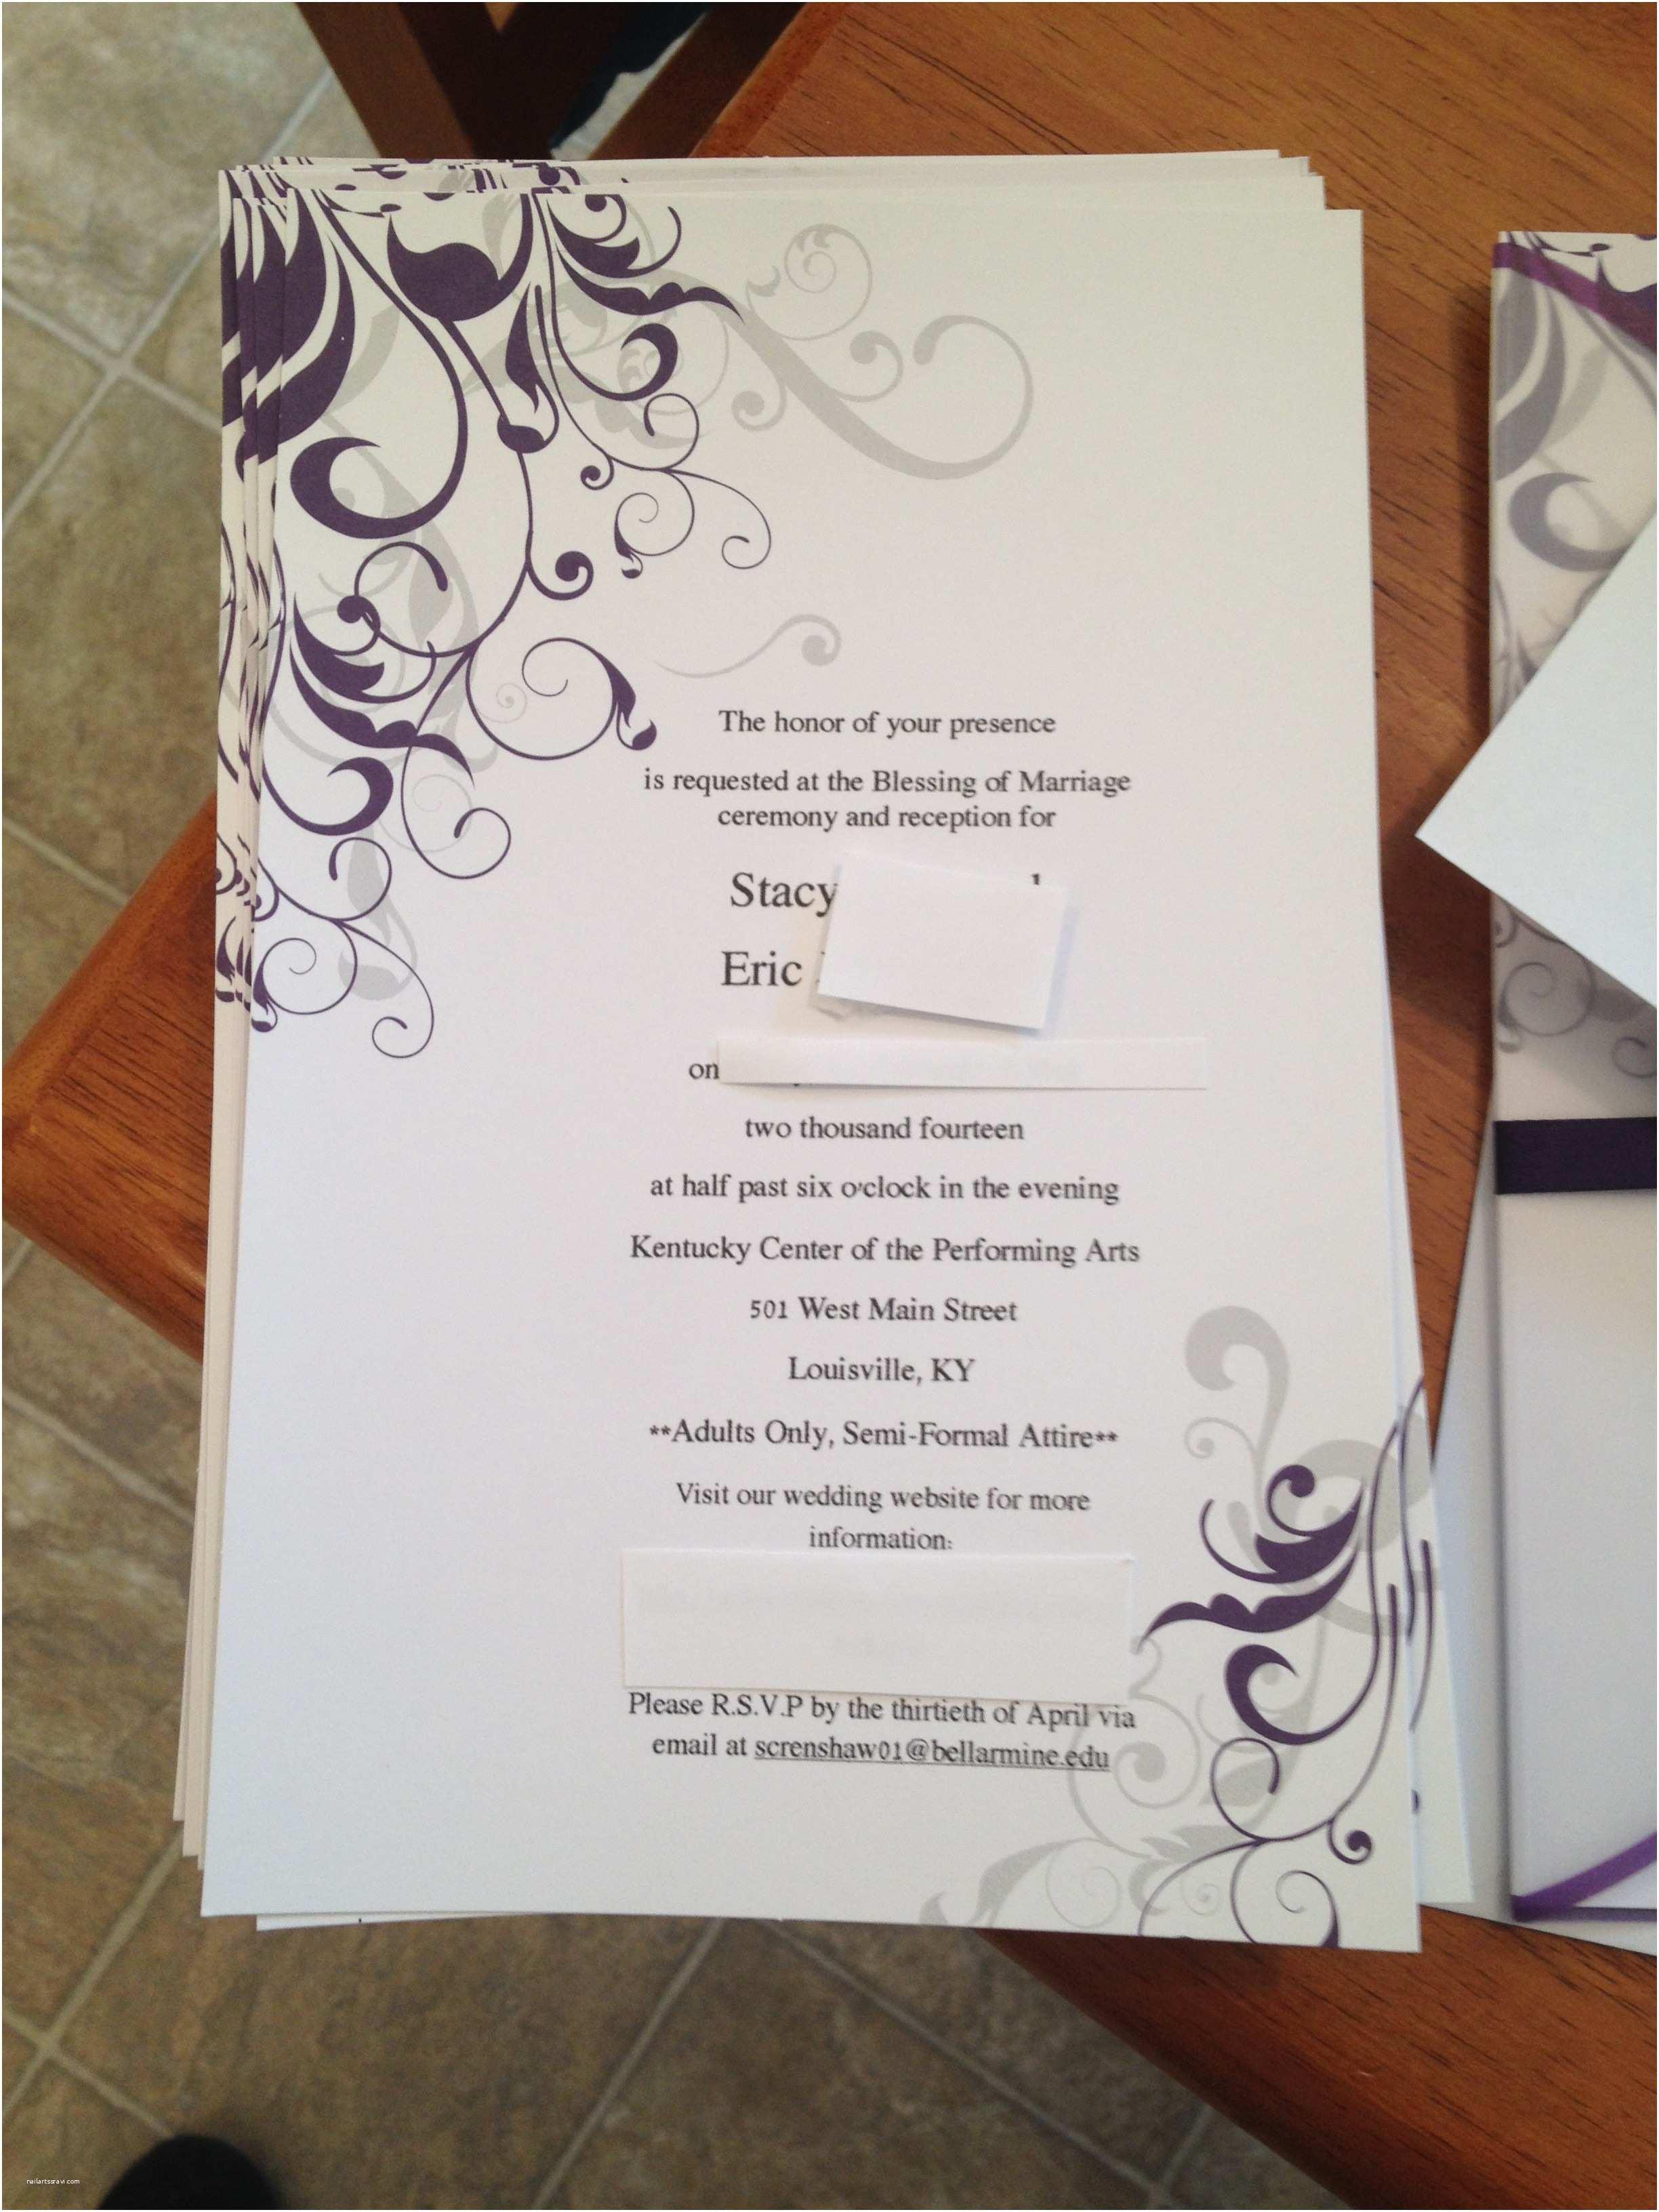 Hobby Lobby Baby Shower Invitations Hobby Lobby Wedding Invitation Templates Hobby Lobby Baby